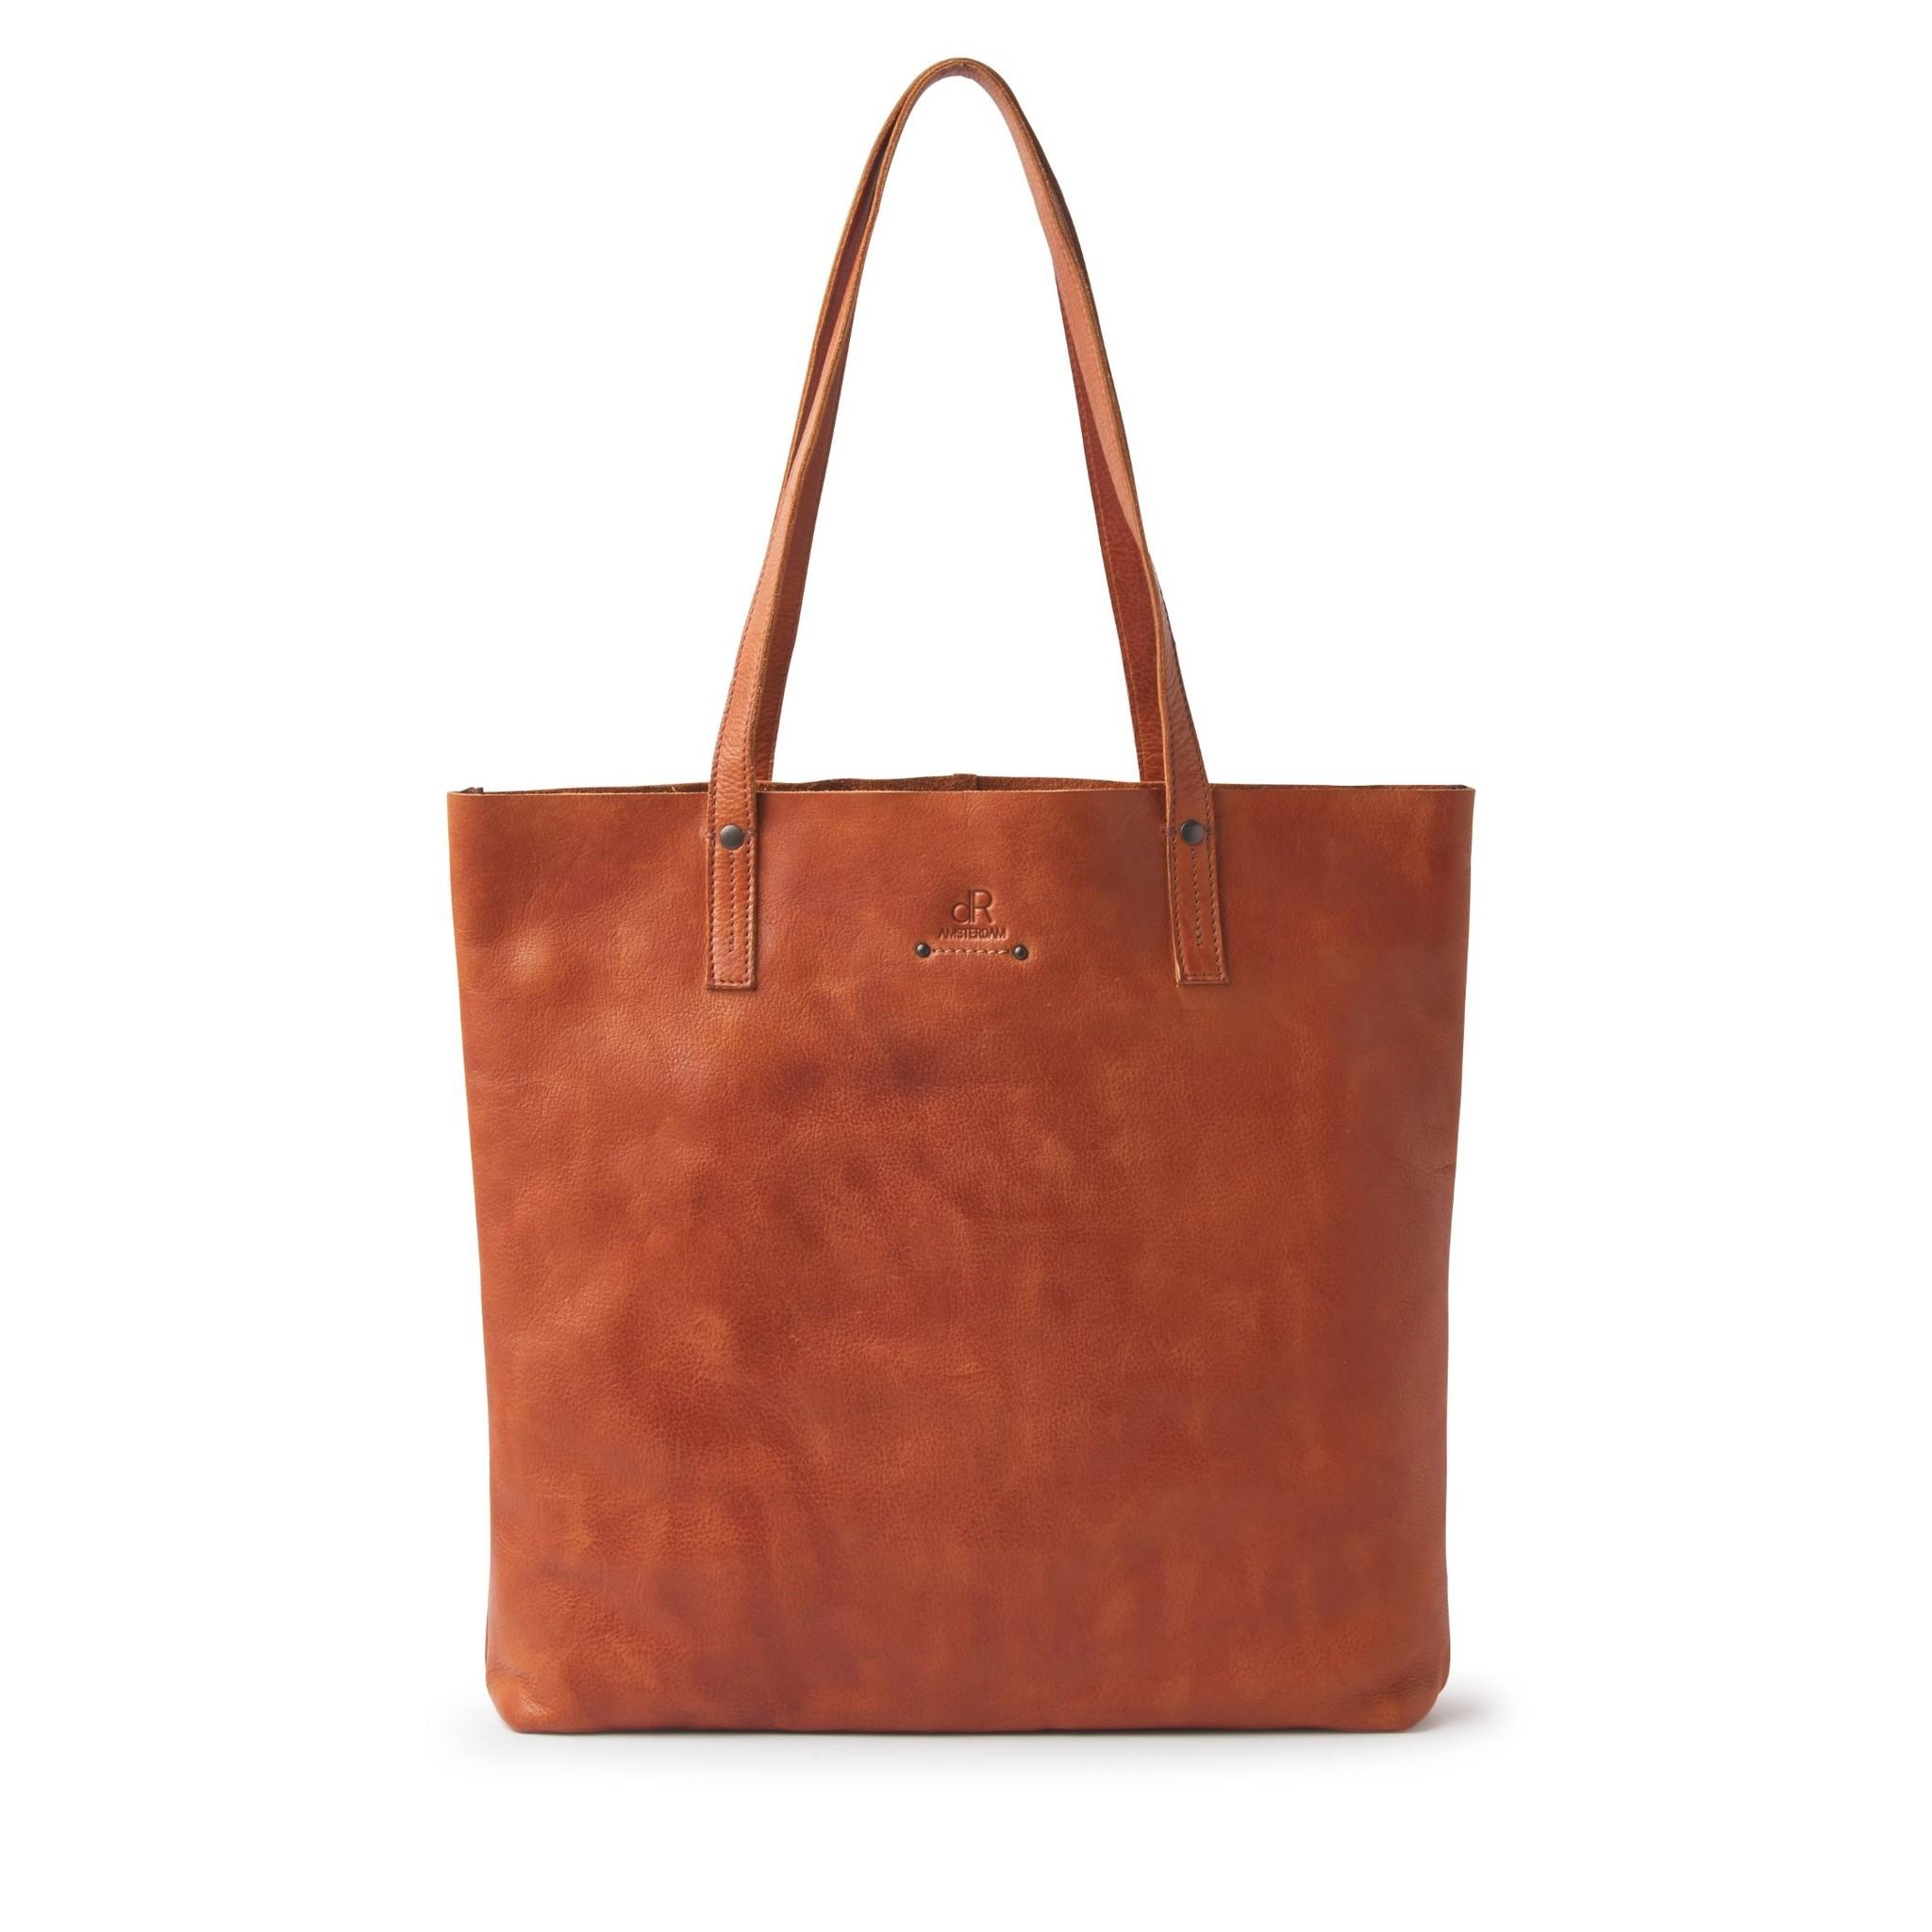 dR Amsterdam Leren Shopper 933550 Camel